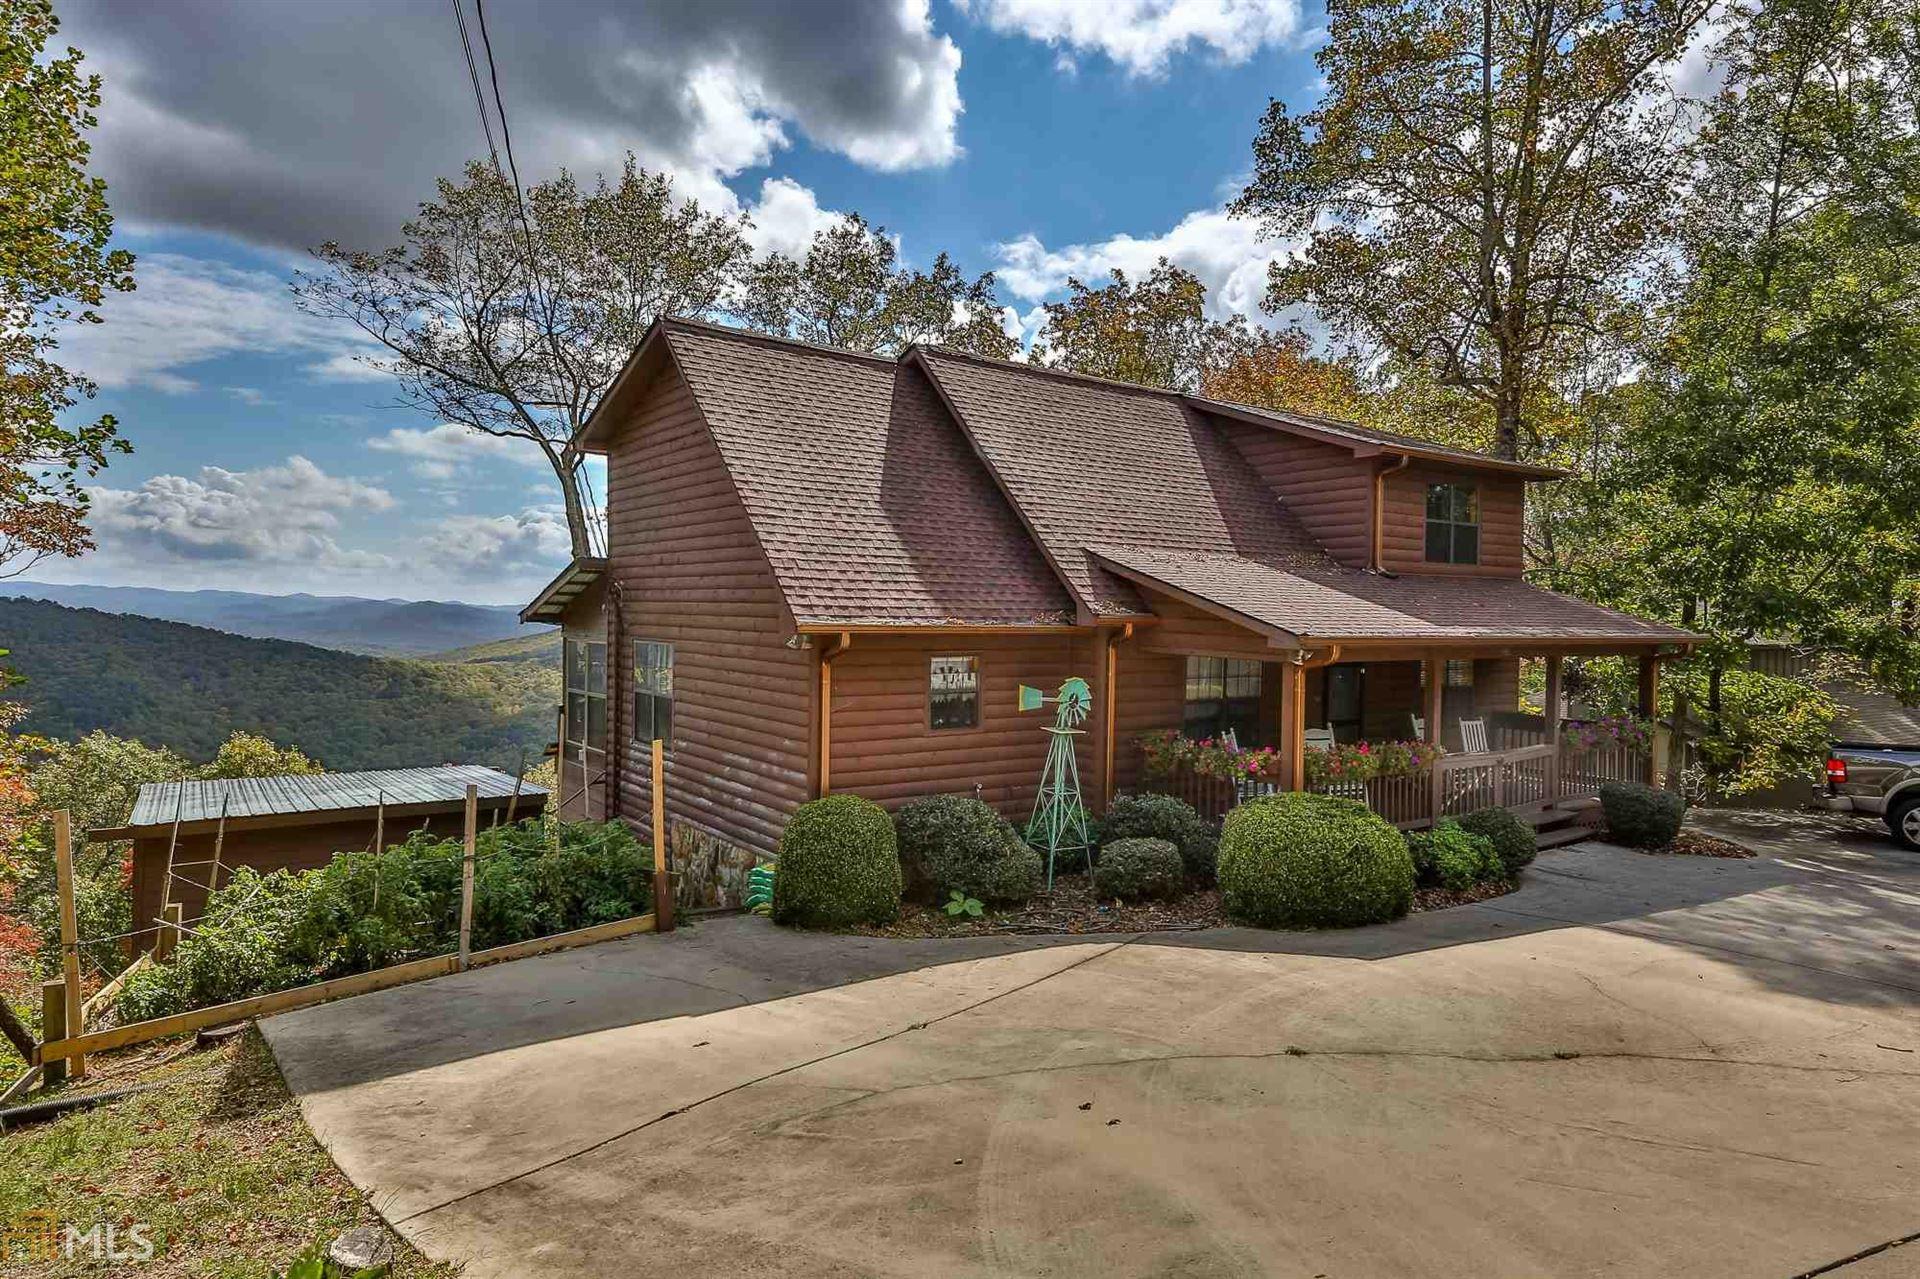 1488 Walnut Ridge, Ellijay, GA 30536 - MLS#: 8879342